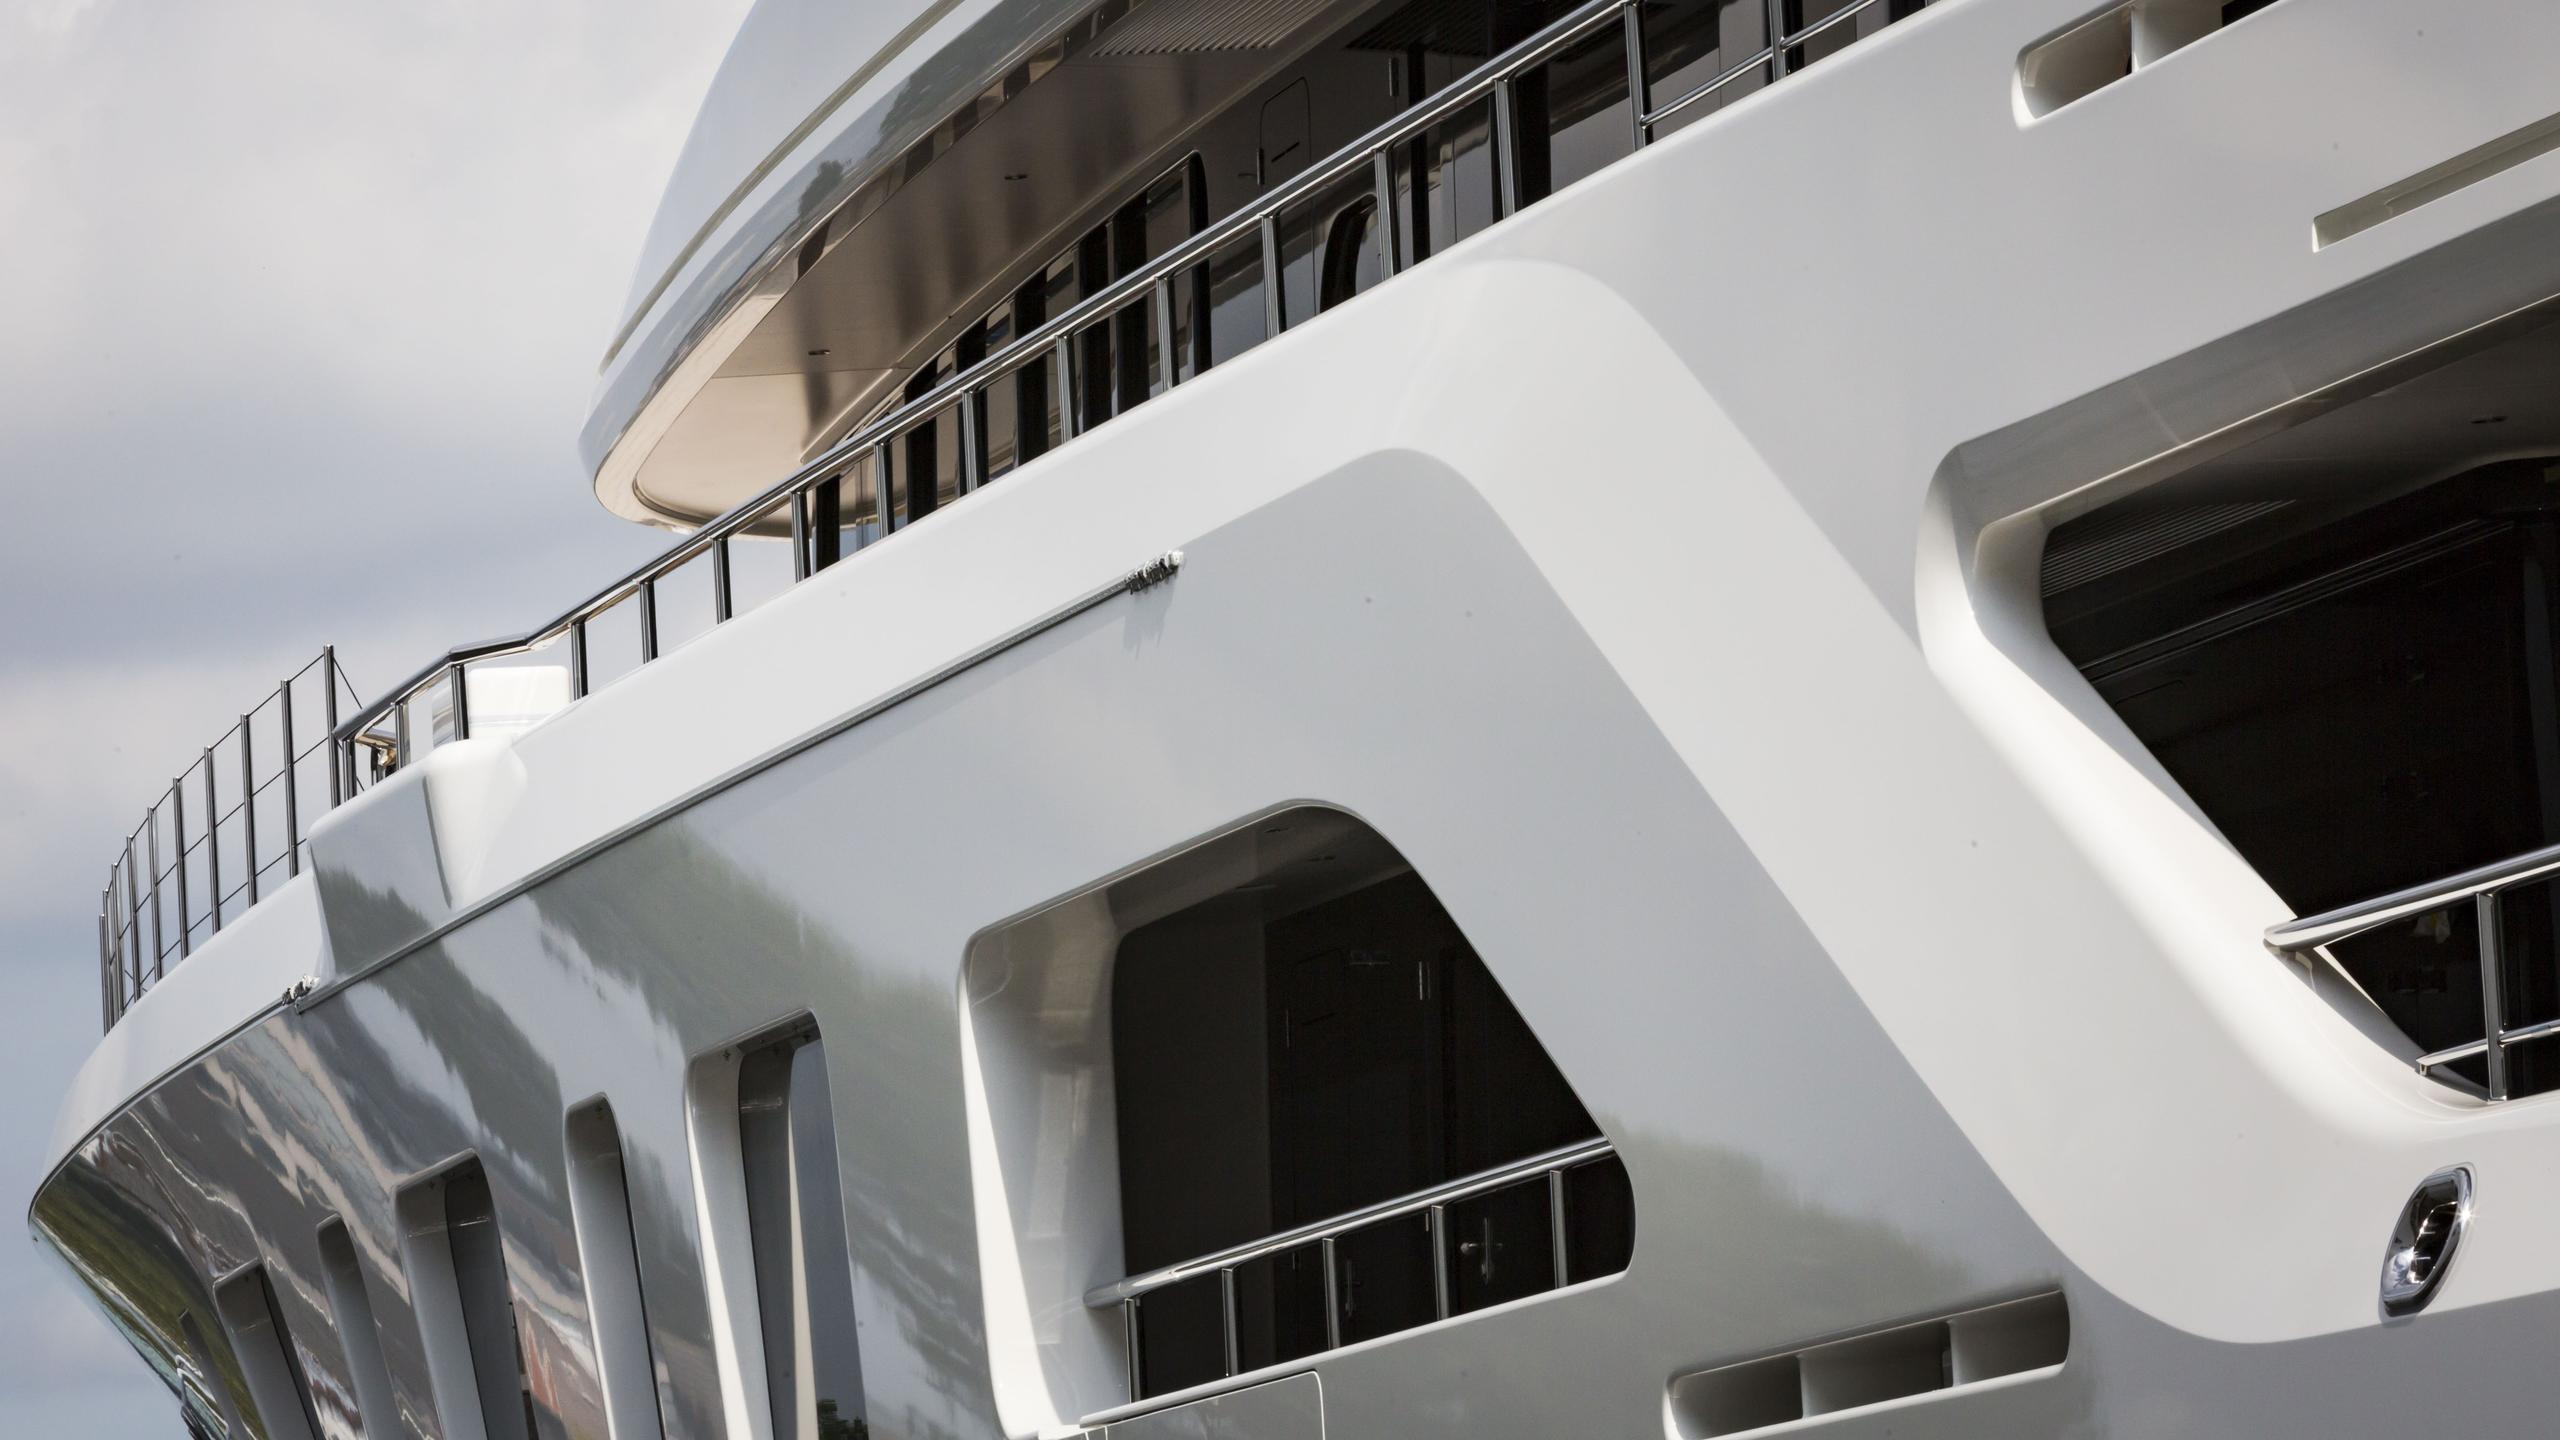 aquarius motoryacht feadship 2016 92m side details